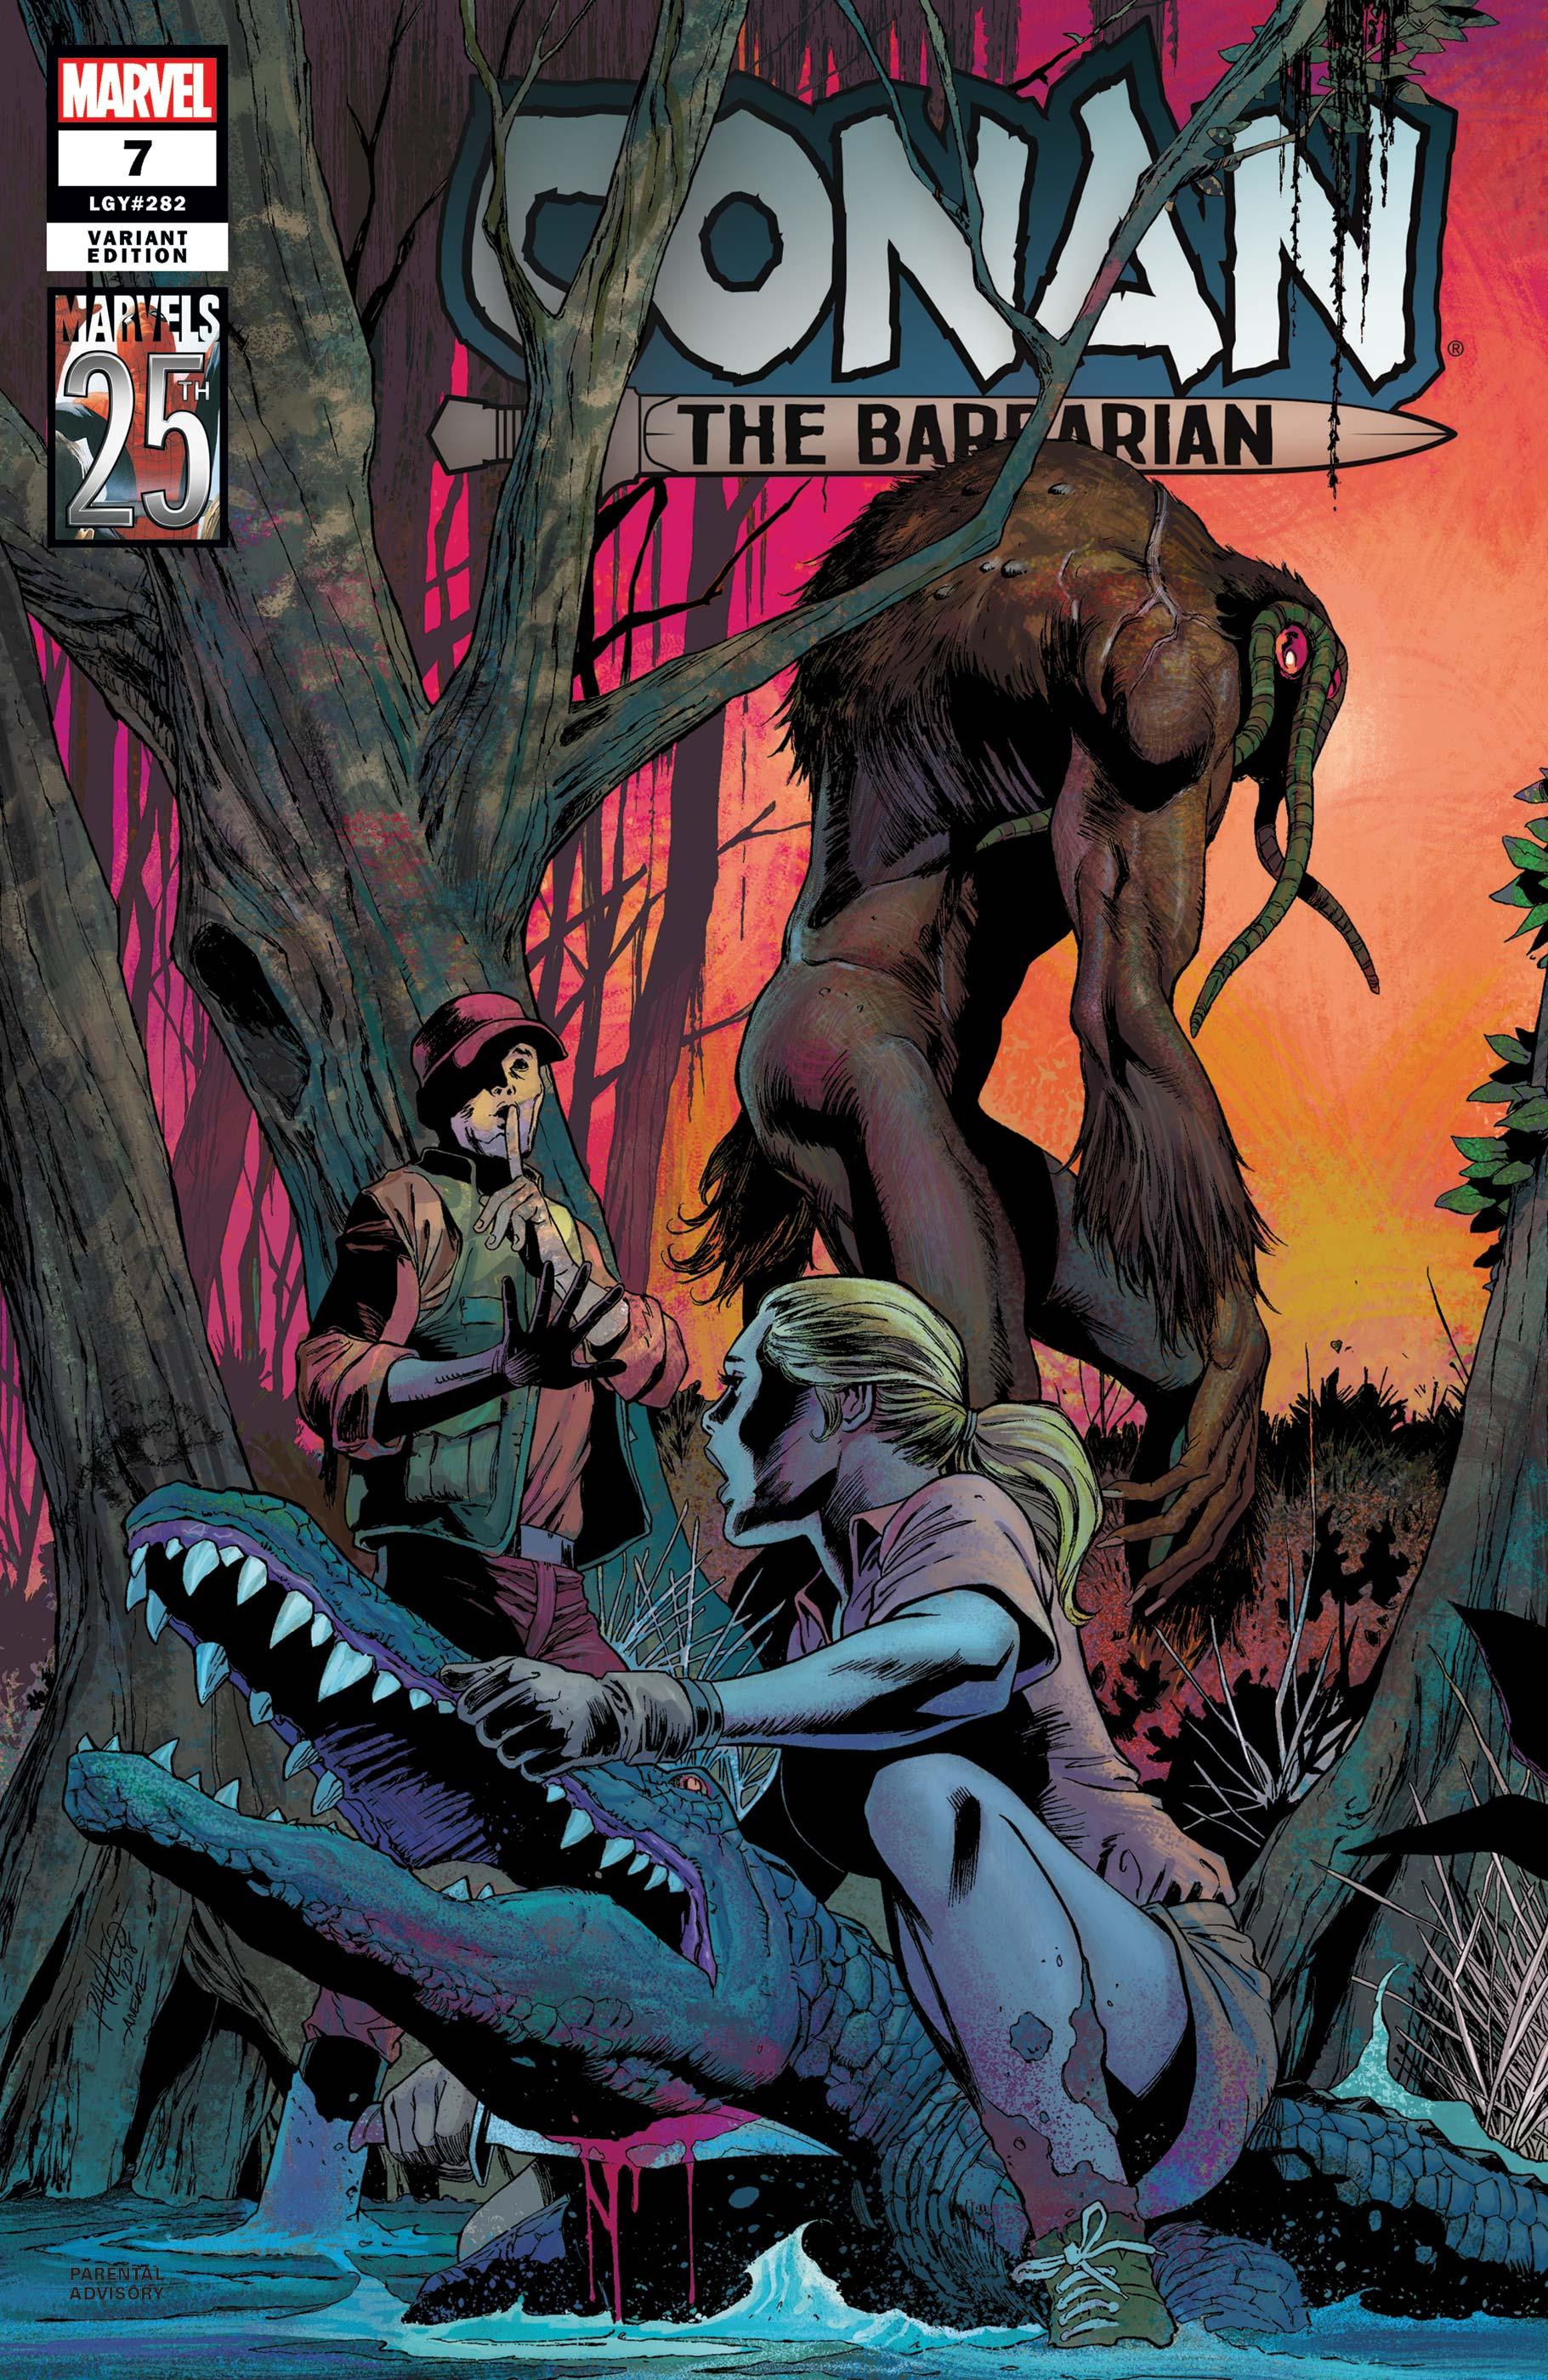 Conan the Barbarian (2019) #7 (Variant)